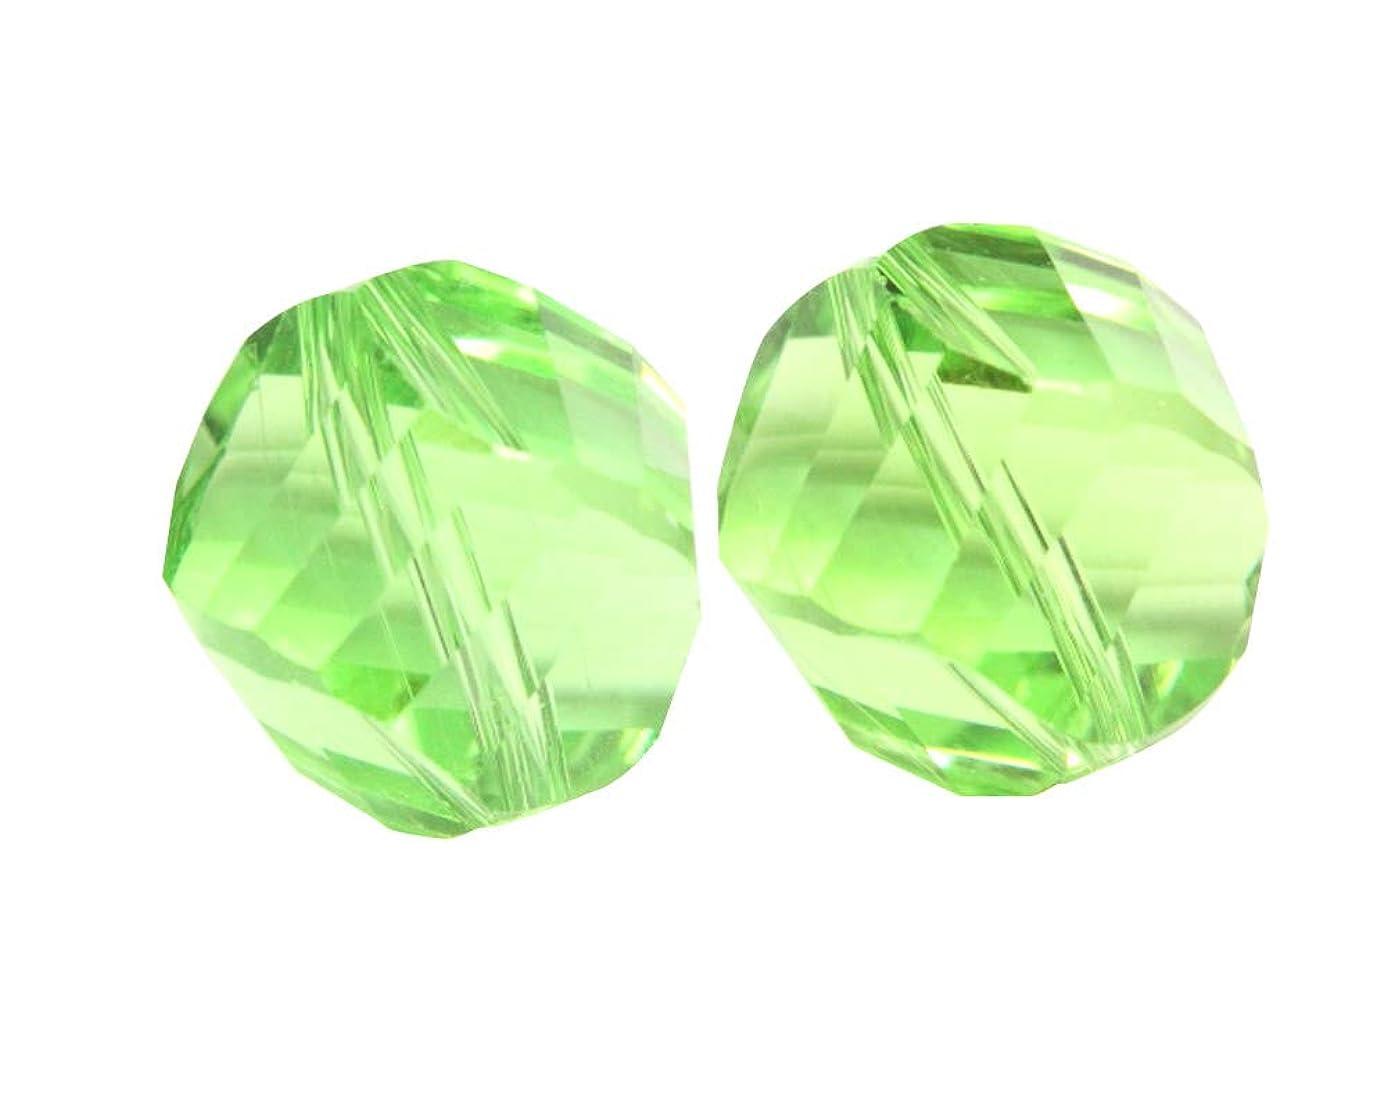 50 6mm Adabele Austrian Helix Crystal Beads Peridot Green Compatible with Swarovski Preciosa Crystals 5020 SSH-616